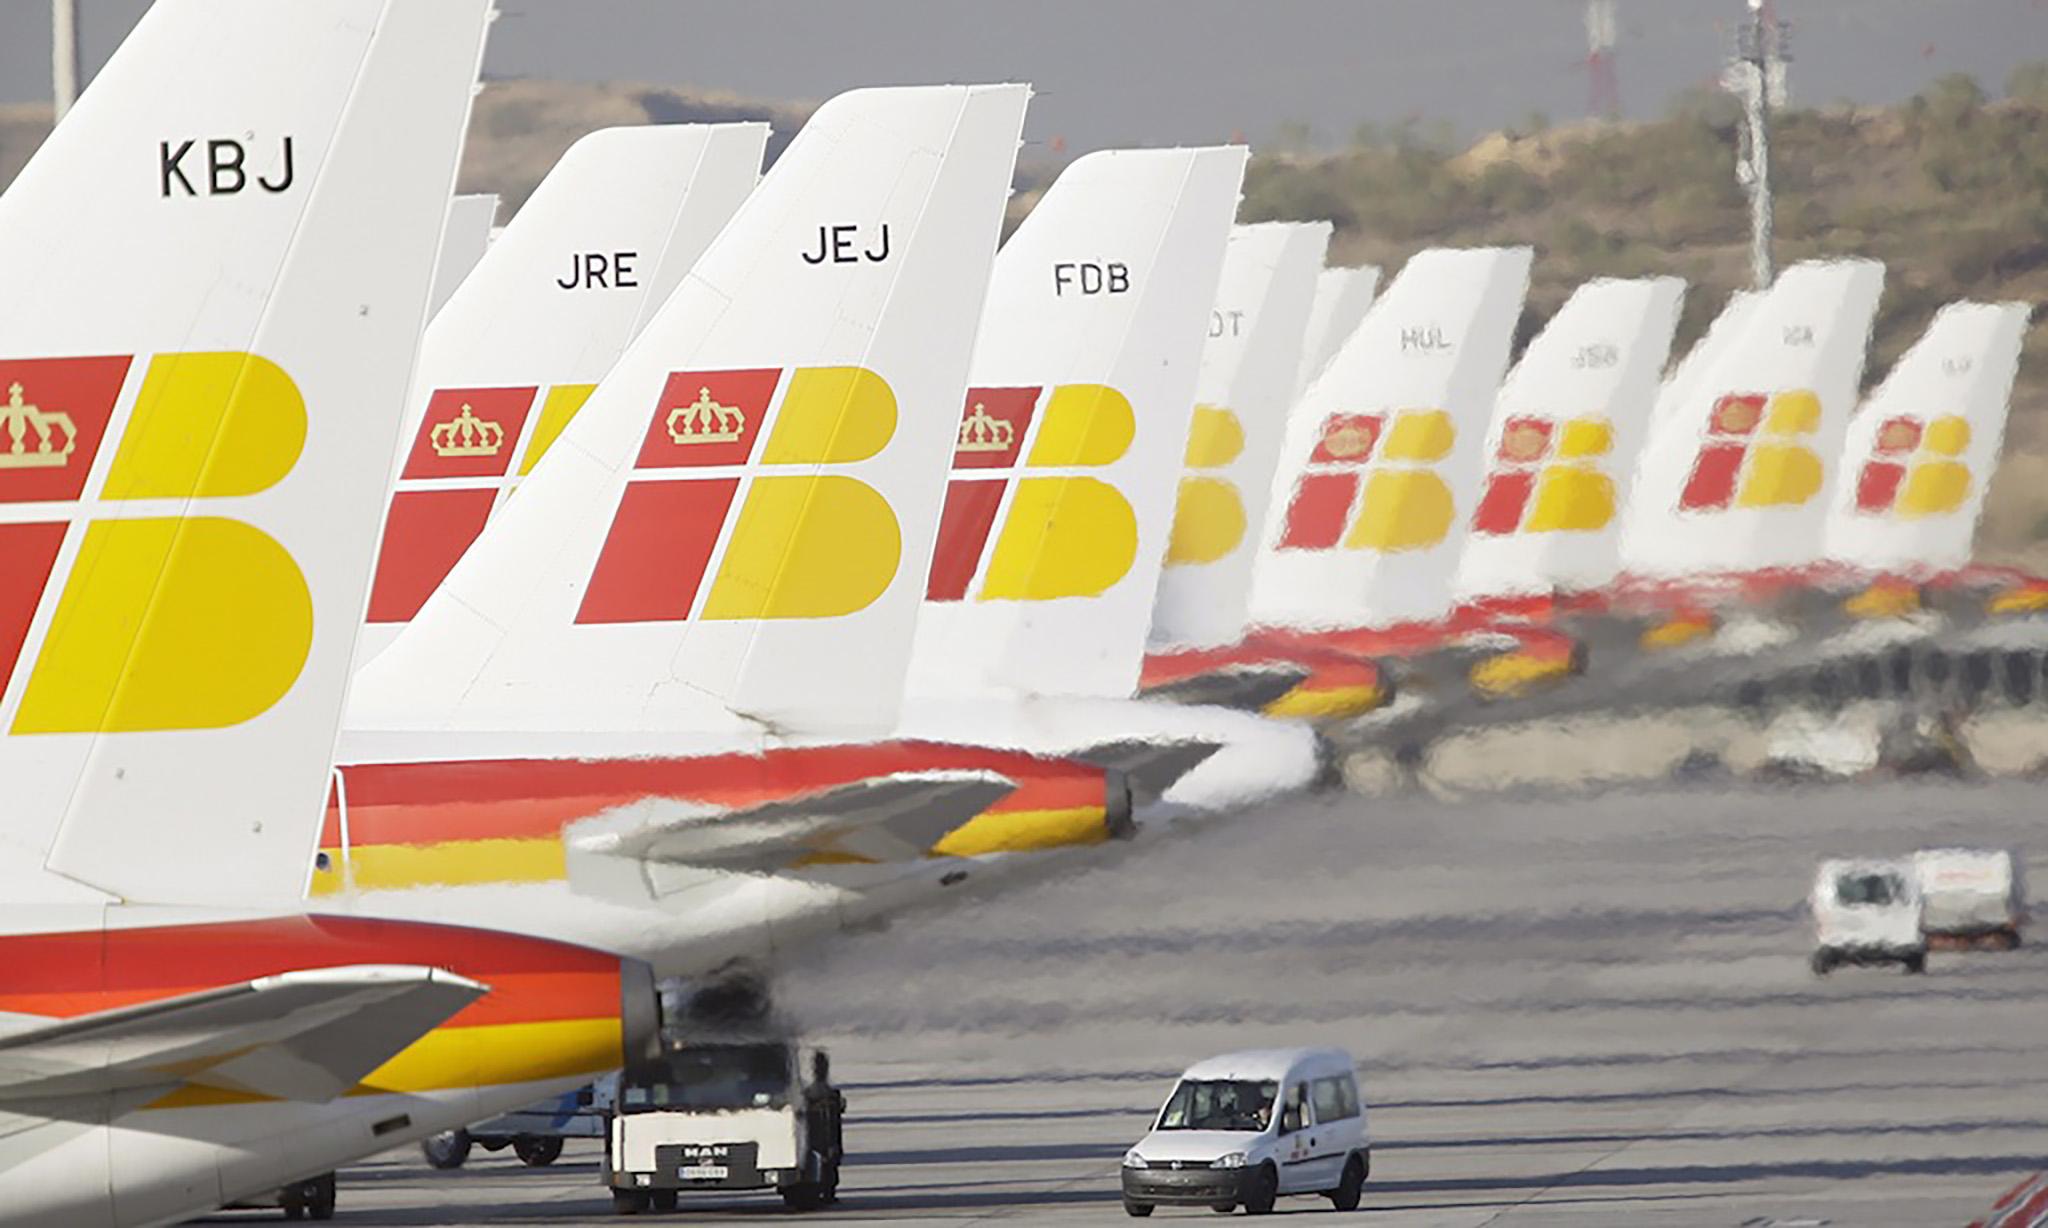 Iberia Airlines.jpg